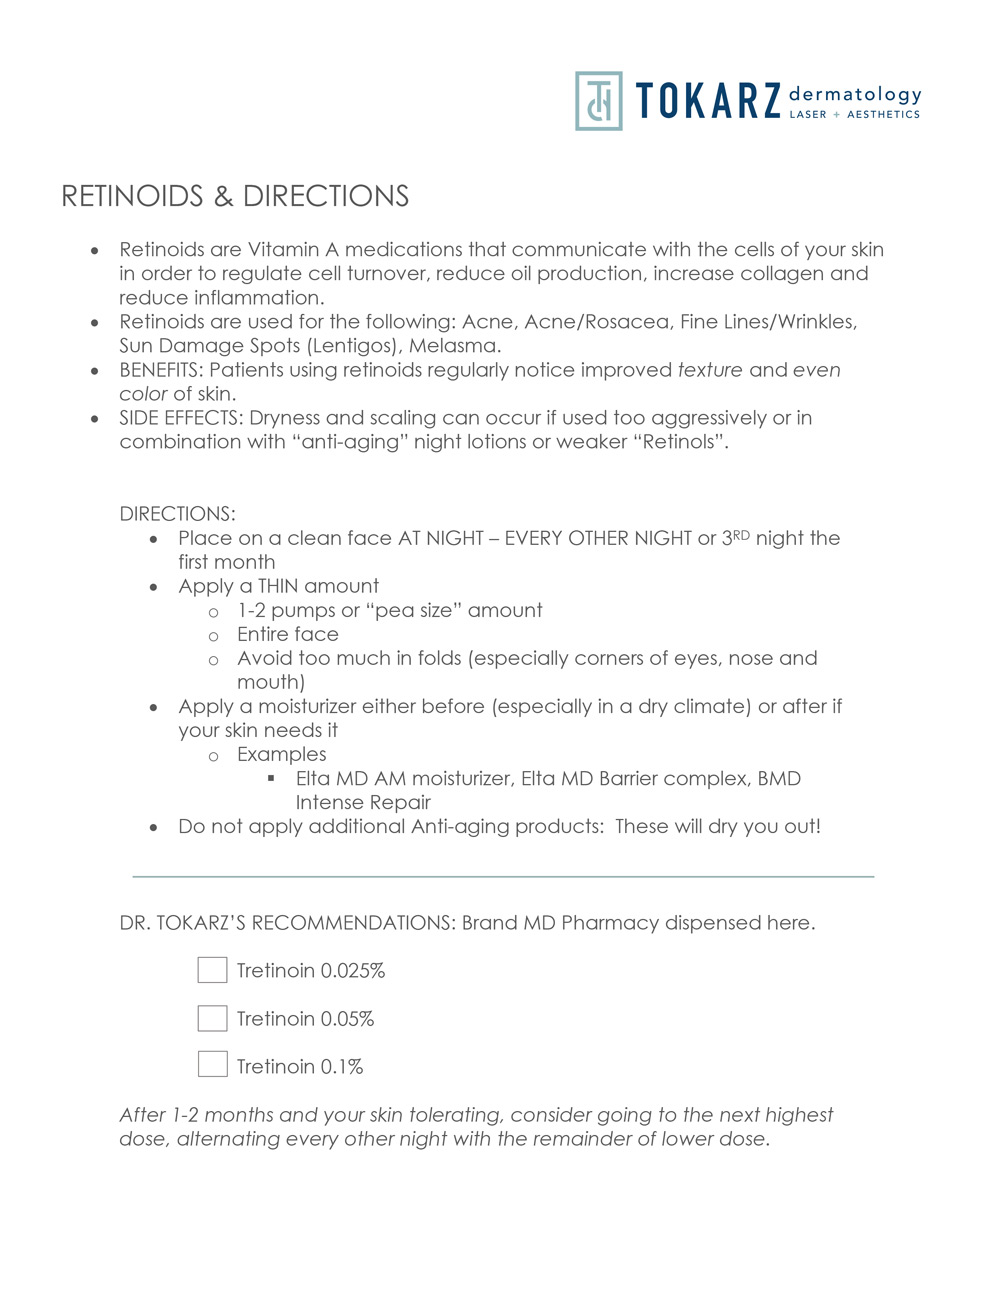 Retinoids & Directions